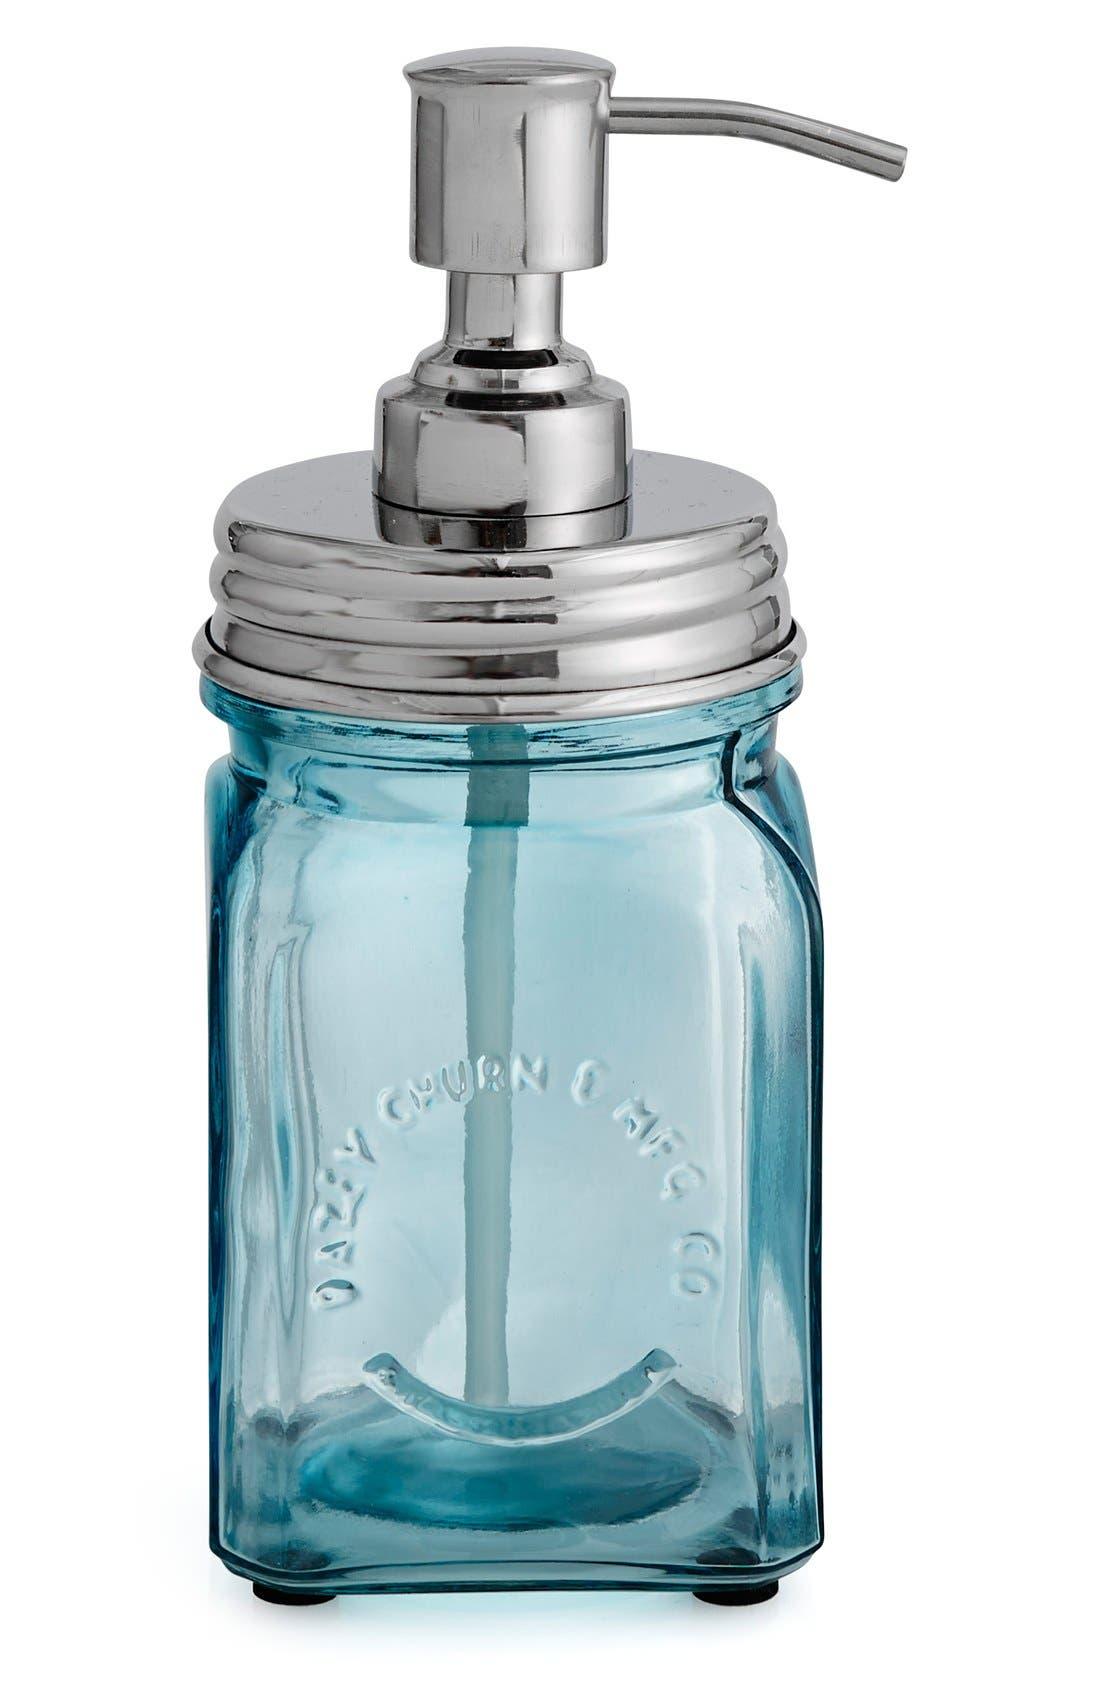 Alternate Image 1 Selected - Paradigm Trends 'Retro' Mason Jar Lotion Dispenser